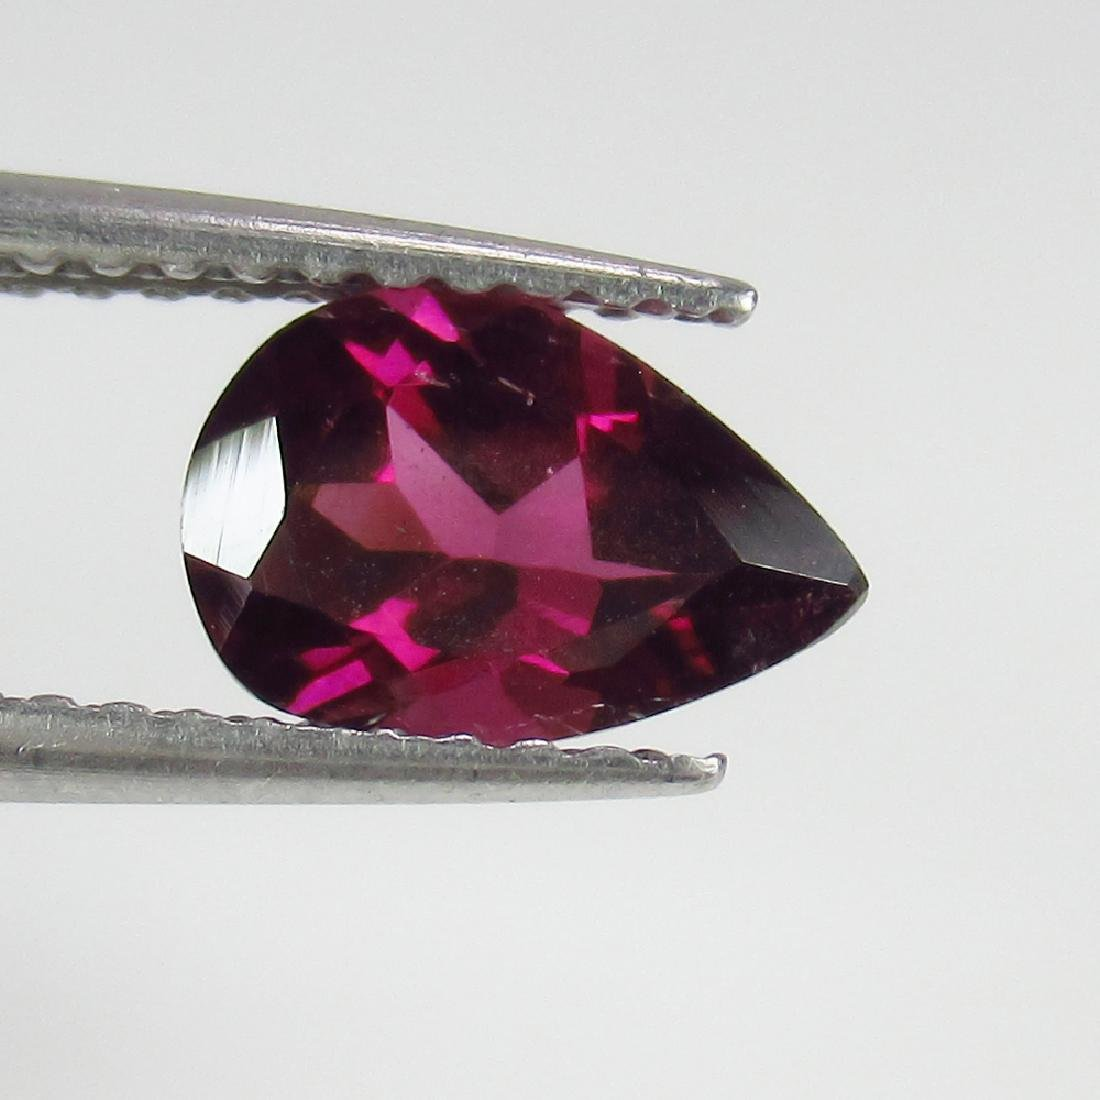 1.15 Ctw Natural Pink Rhodolite Garnet 8X5.5 mm Pear